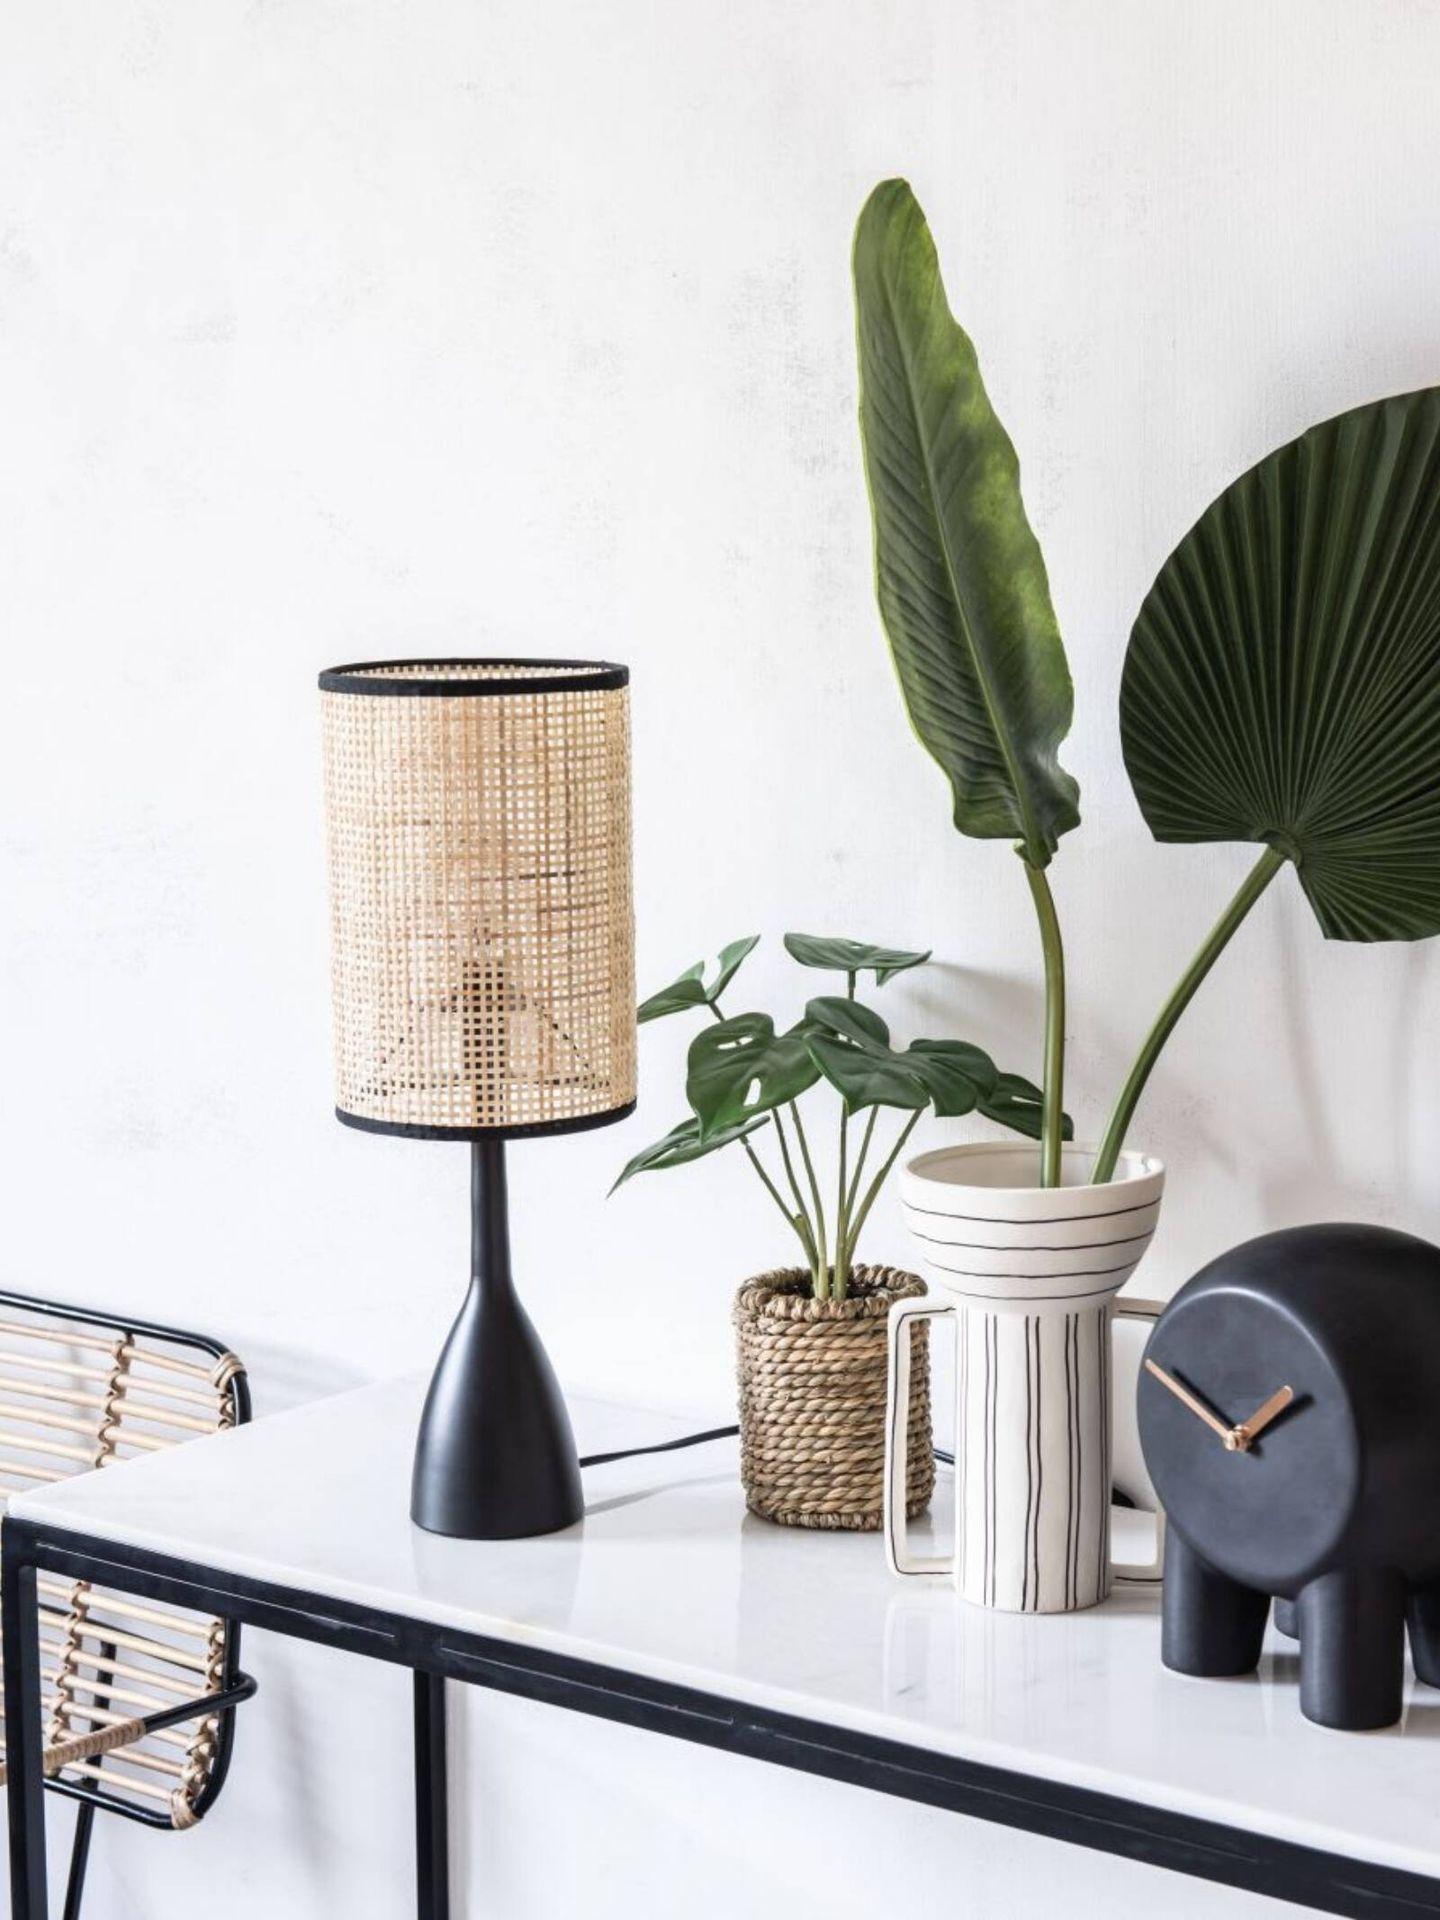 Novedades en lámparas de Maisons du Monde para tu casa. (Cortesía)